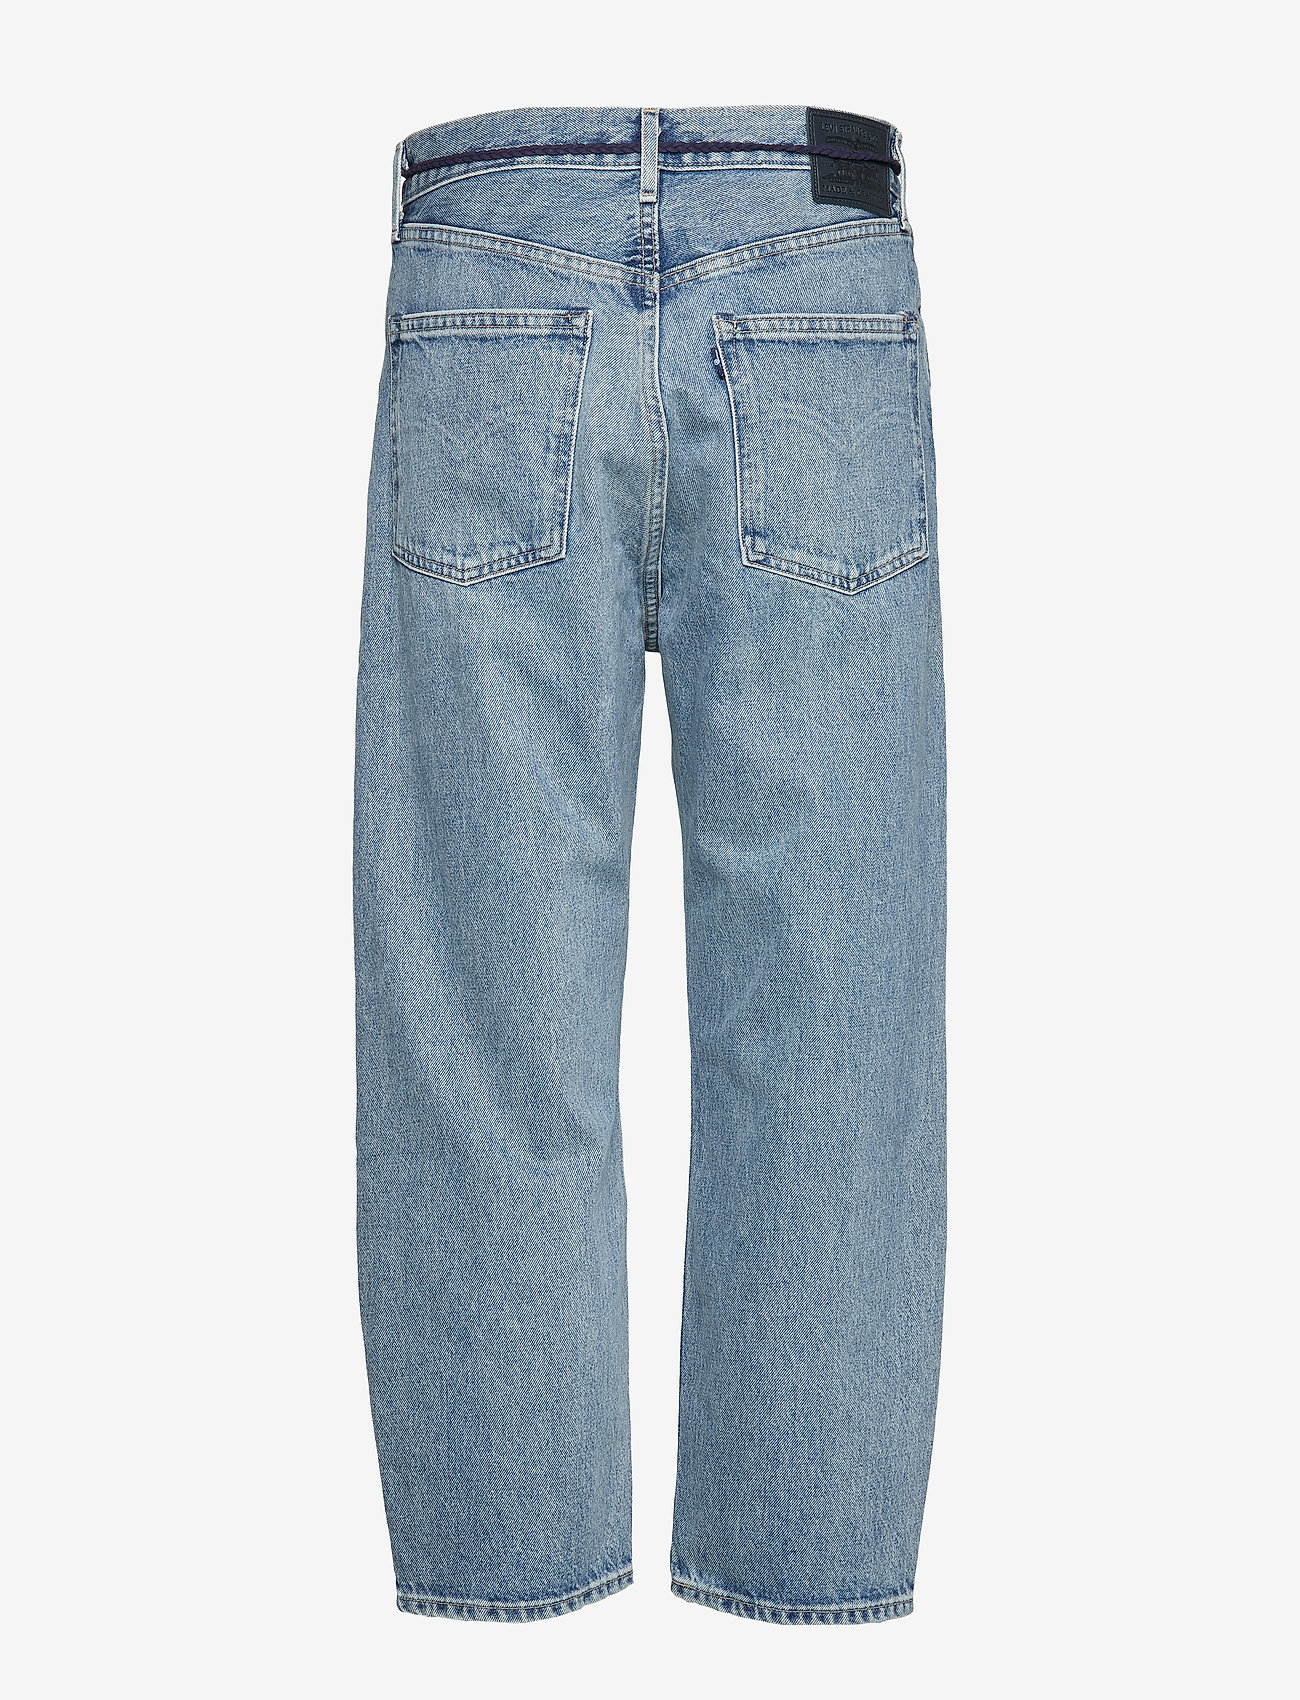 Levi's Made & Crafted - LMC BARREL LMC LEGEND - dżinsy chłopaka - med indigo - worn in - 1